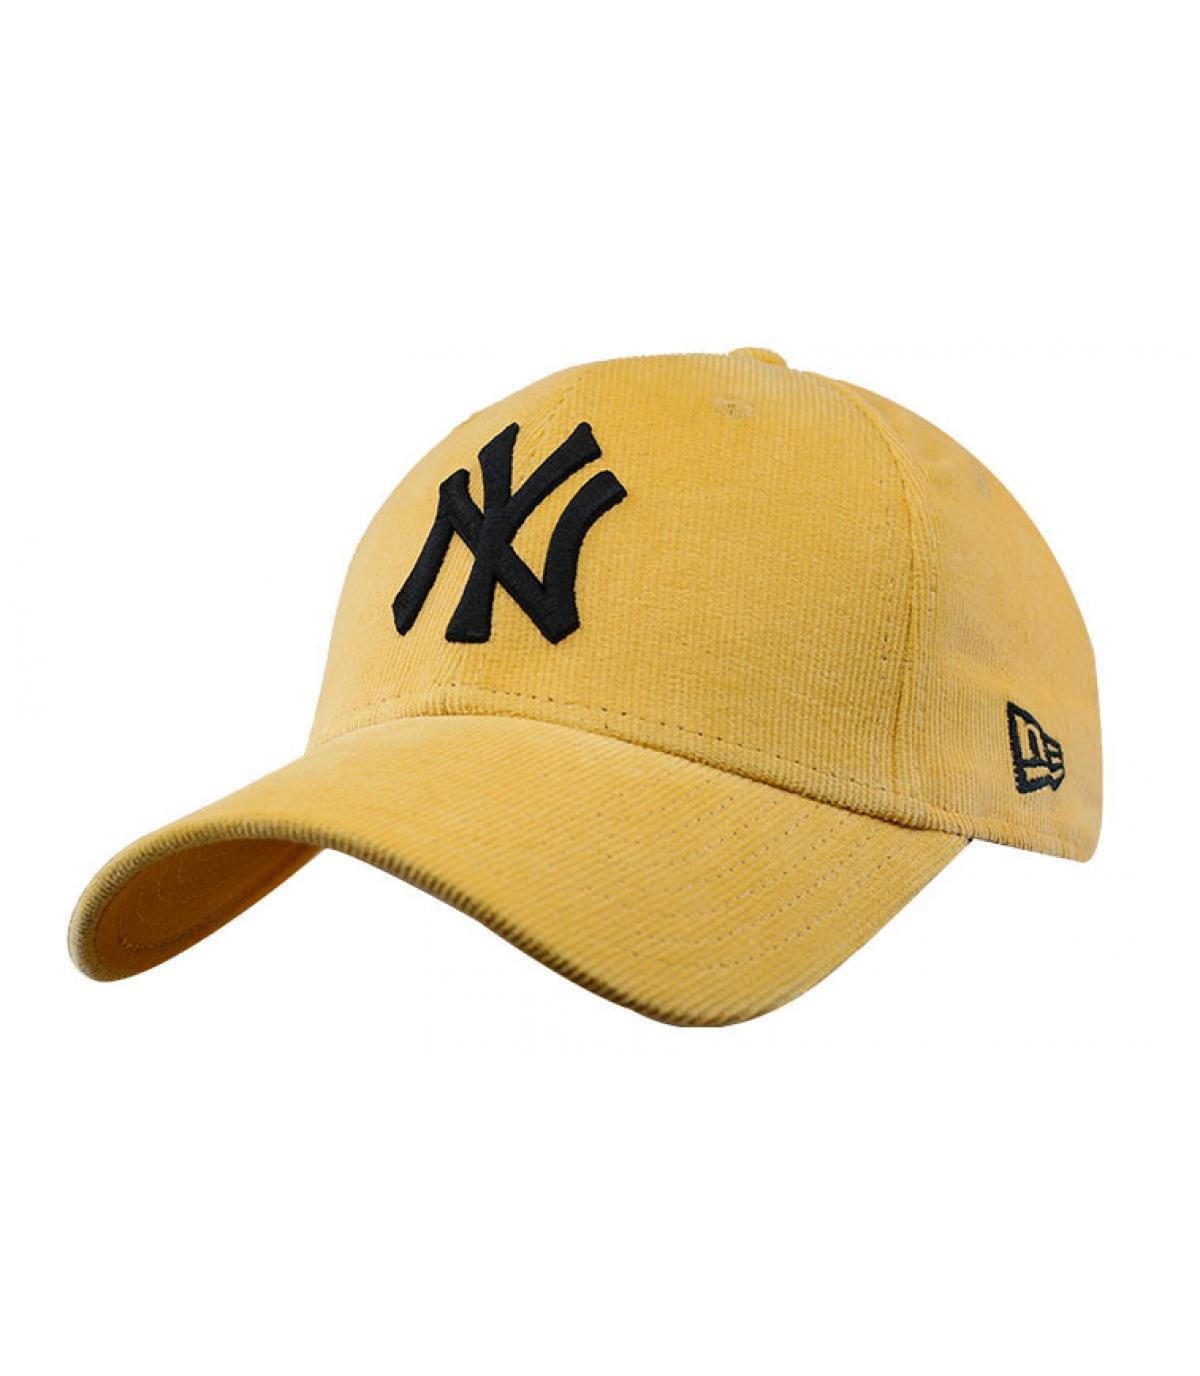 casquette NY velours jaune